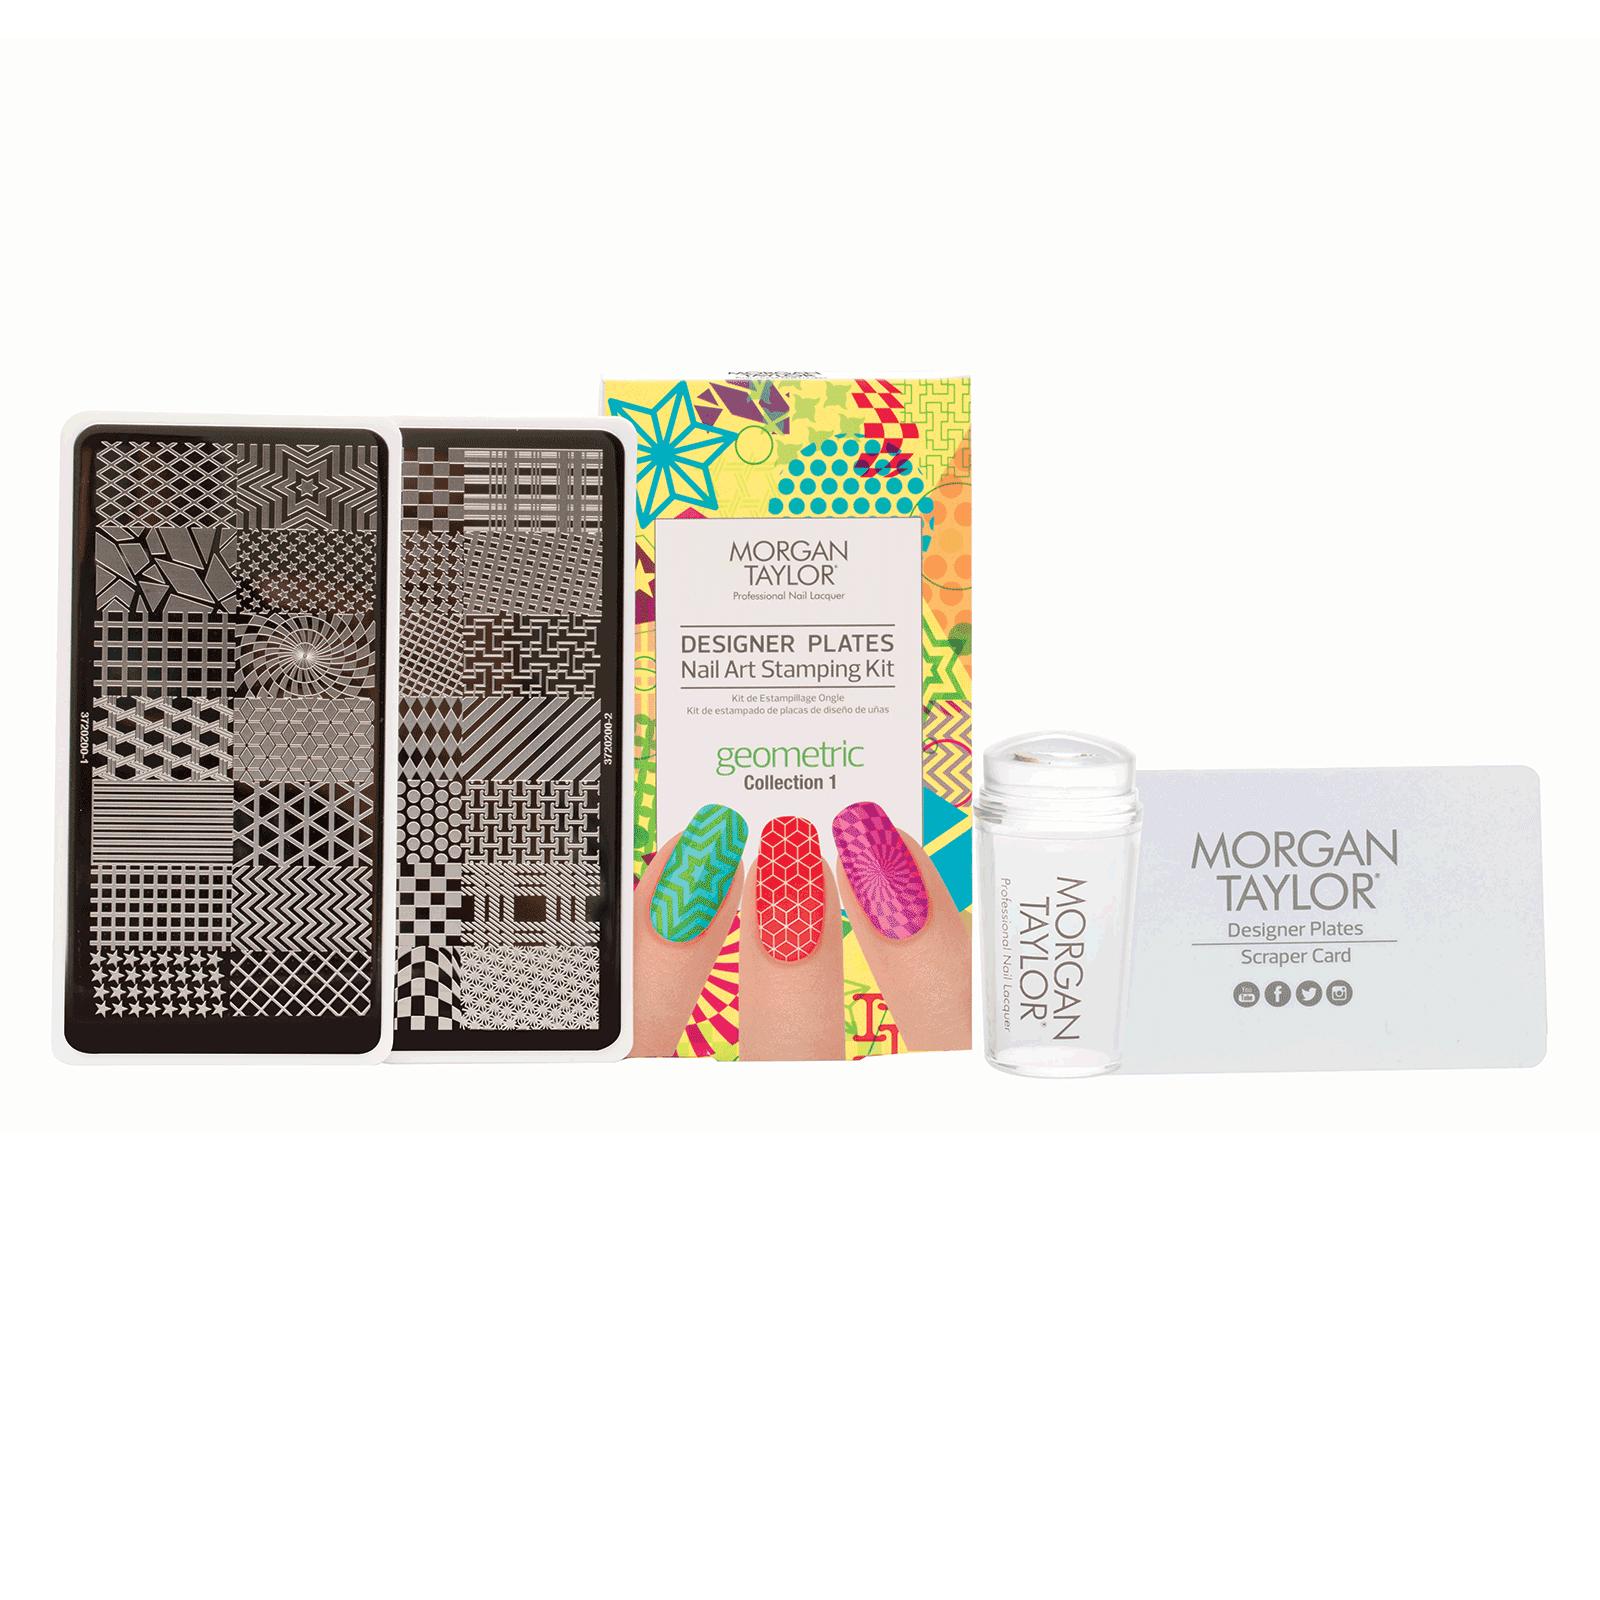 Nail Art Stamping Kit | Geometric - Morgan Taylor | CosmoProf